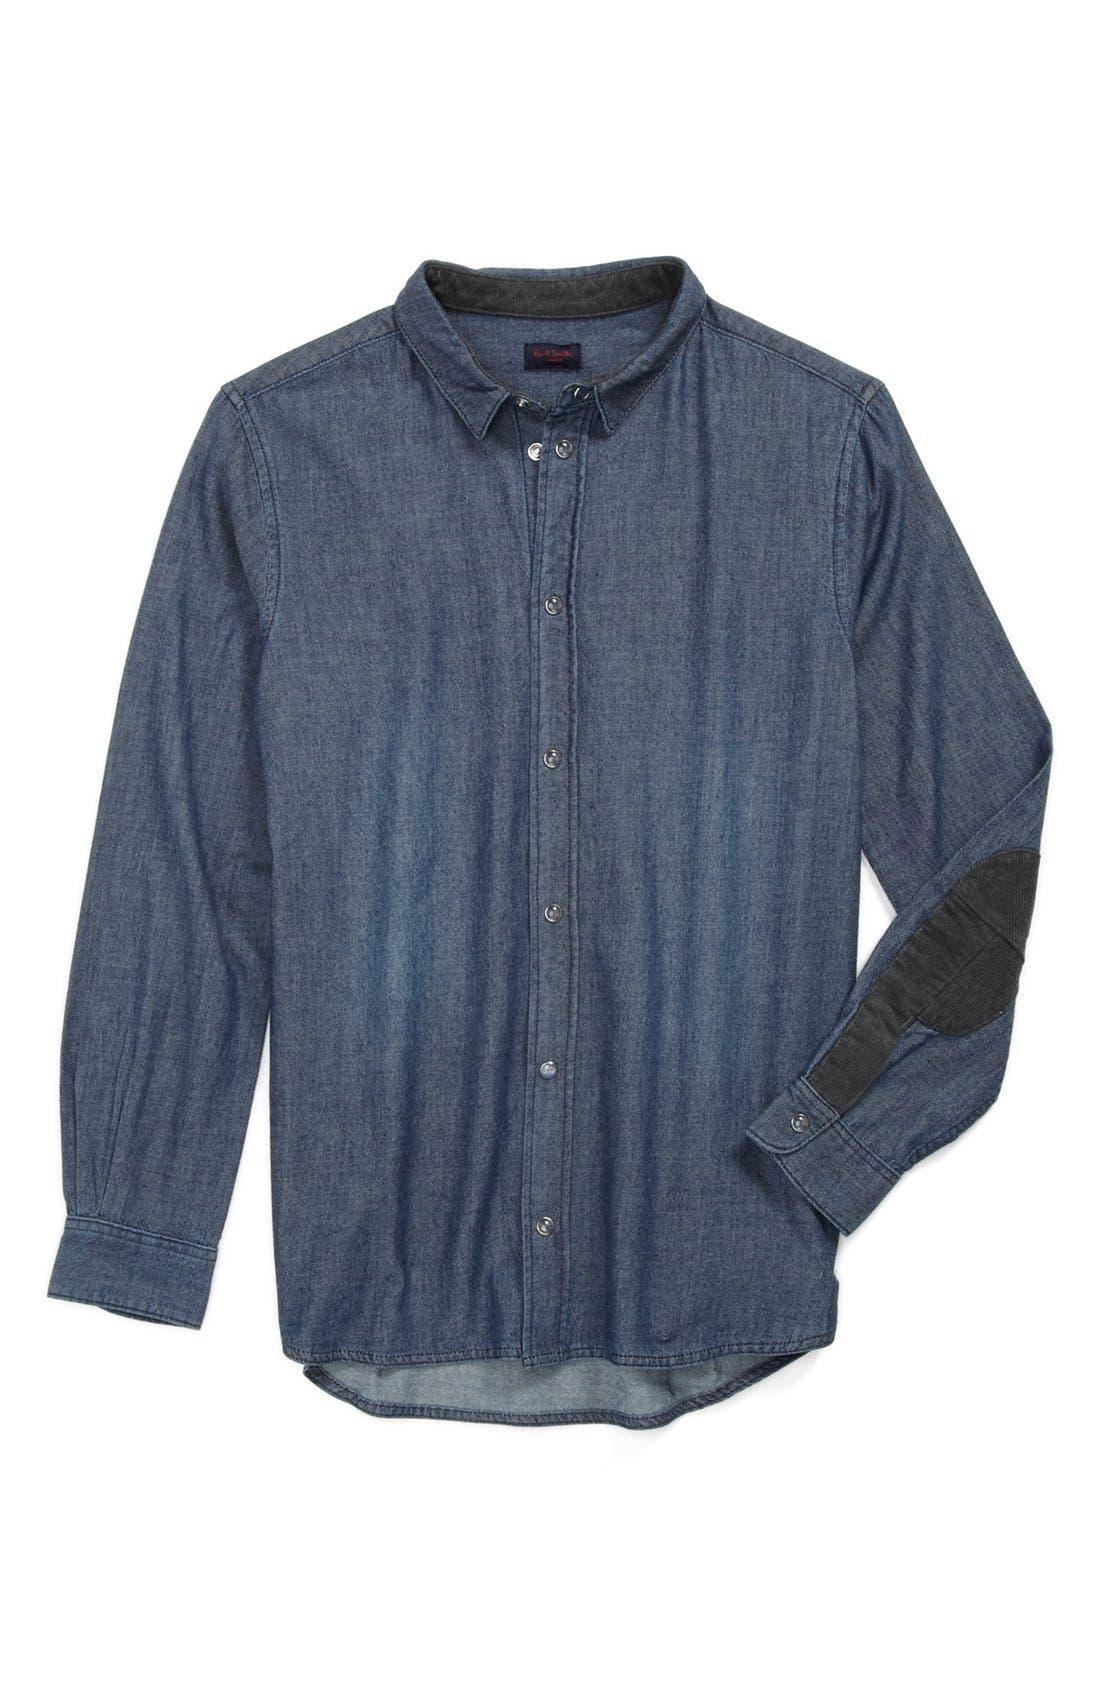 Alternate Image 1 Selected - Paul Smith Junior 'Enock' Denim Shirt (Little Boys & Big Boys)